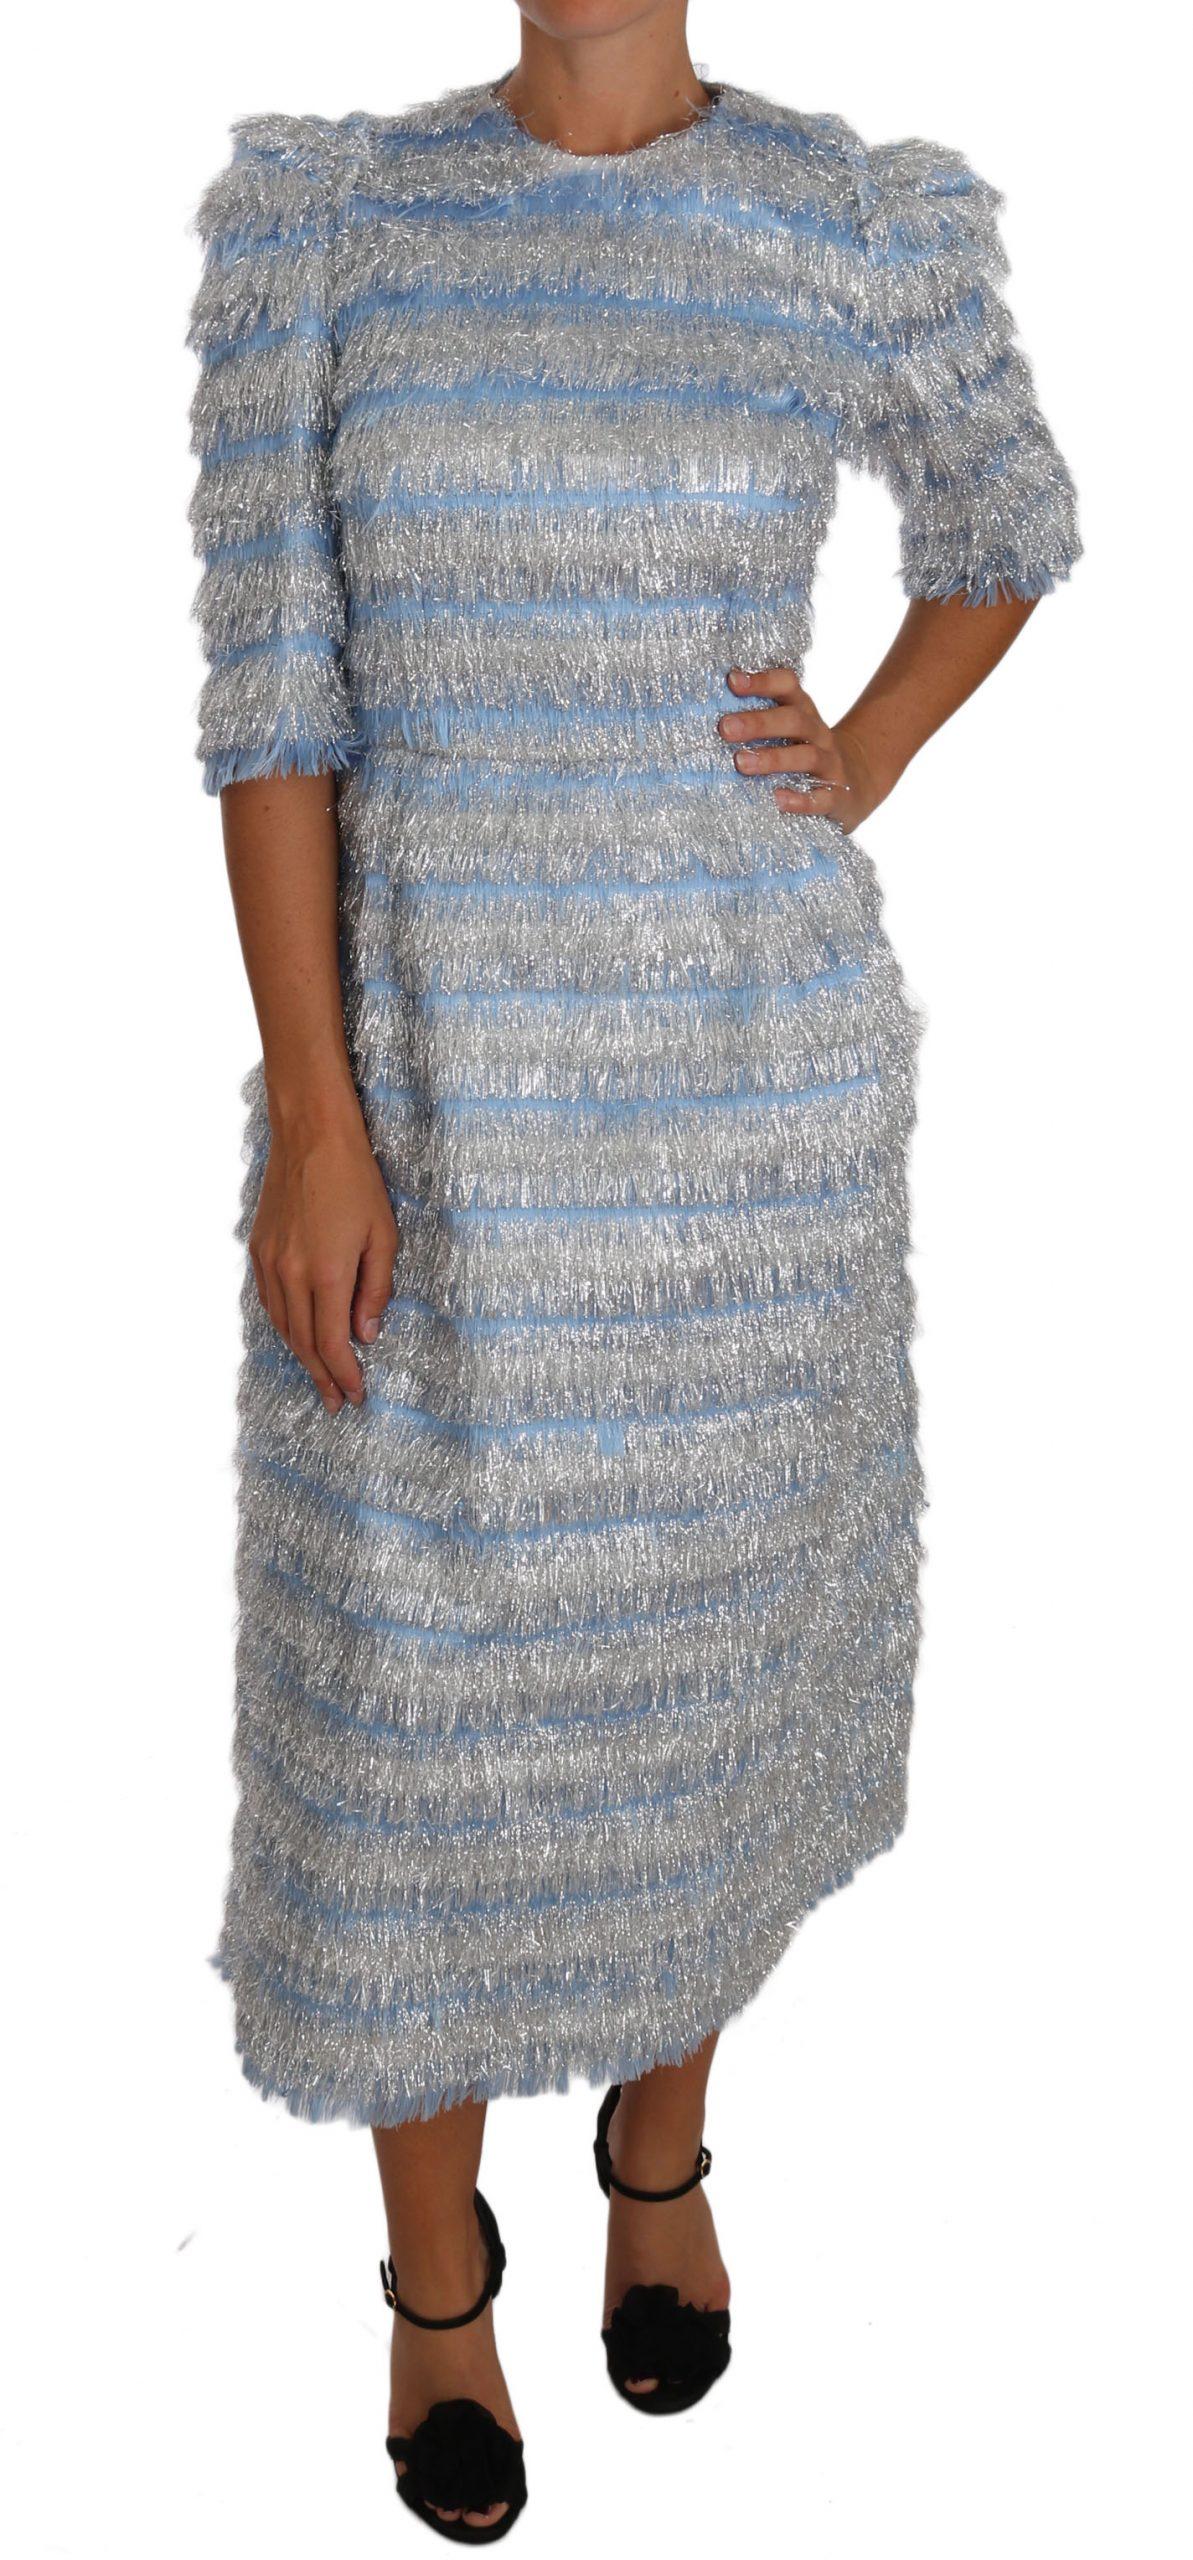 Dolce & Gabbana Women's Fringe Midi Sheath Dress Blue DR1464 - IT44|L